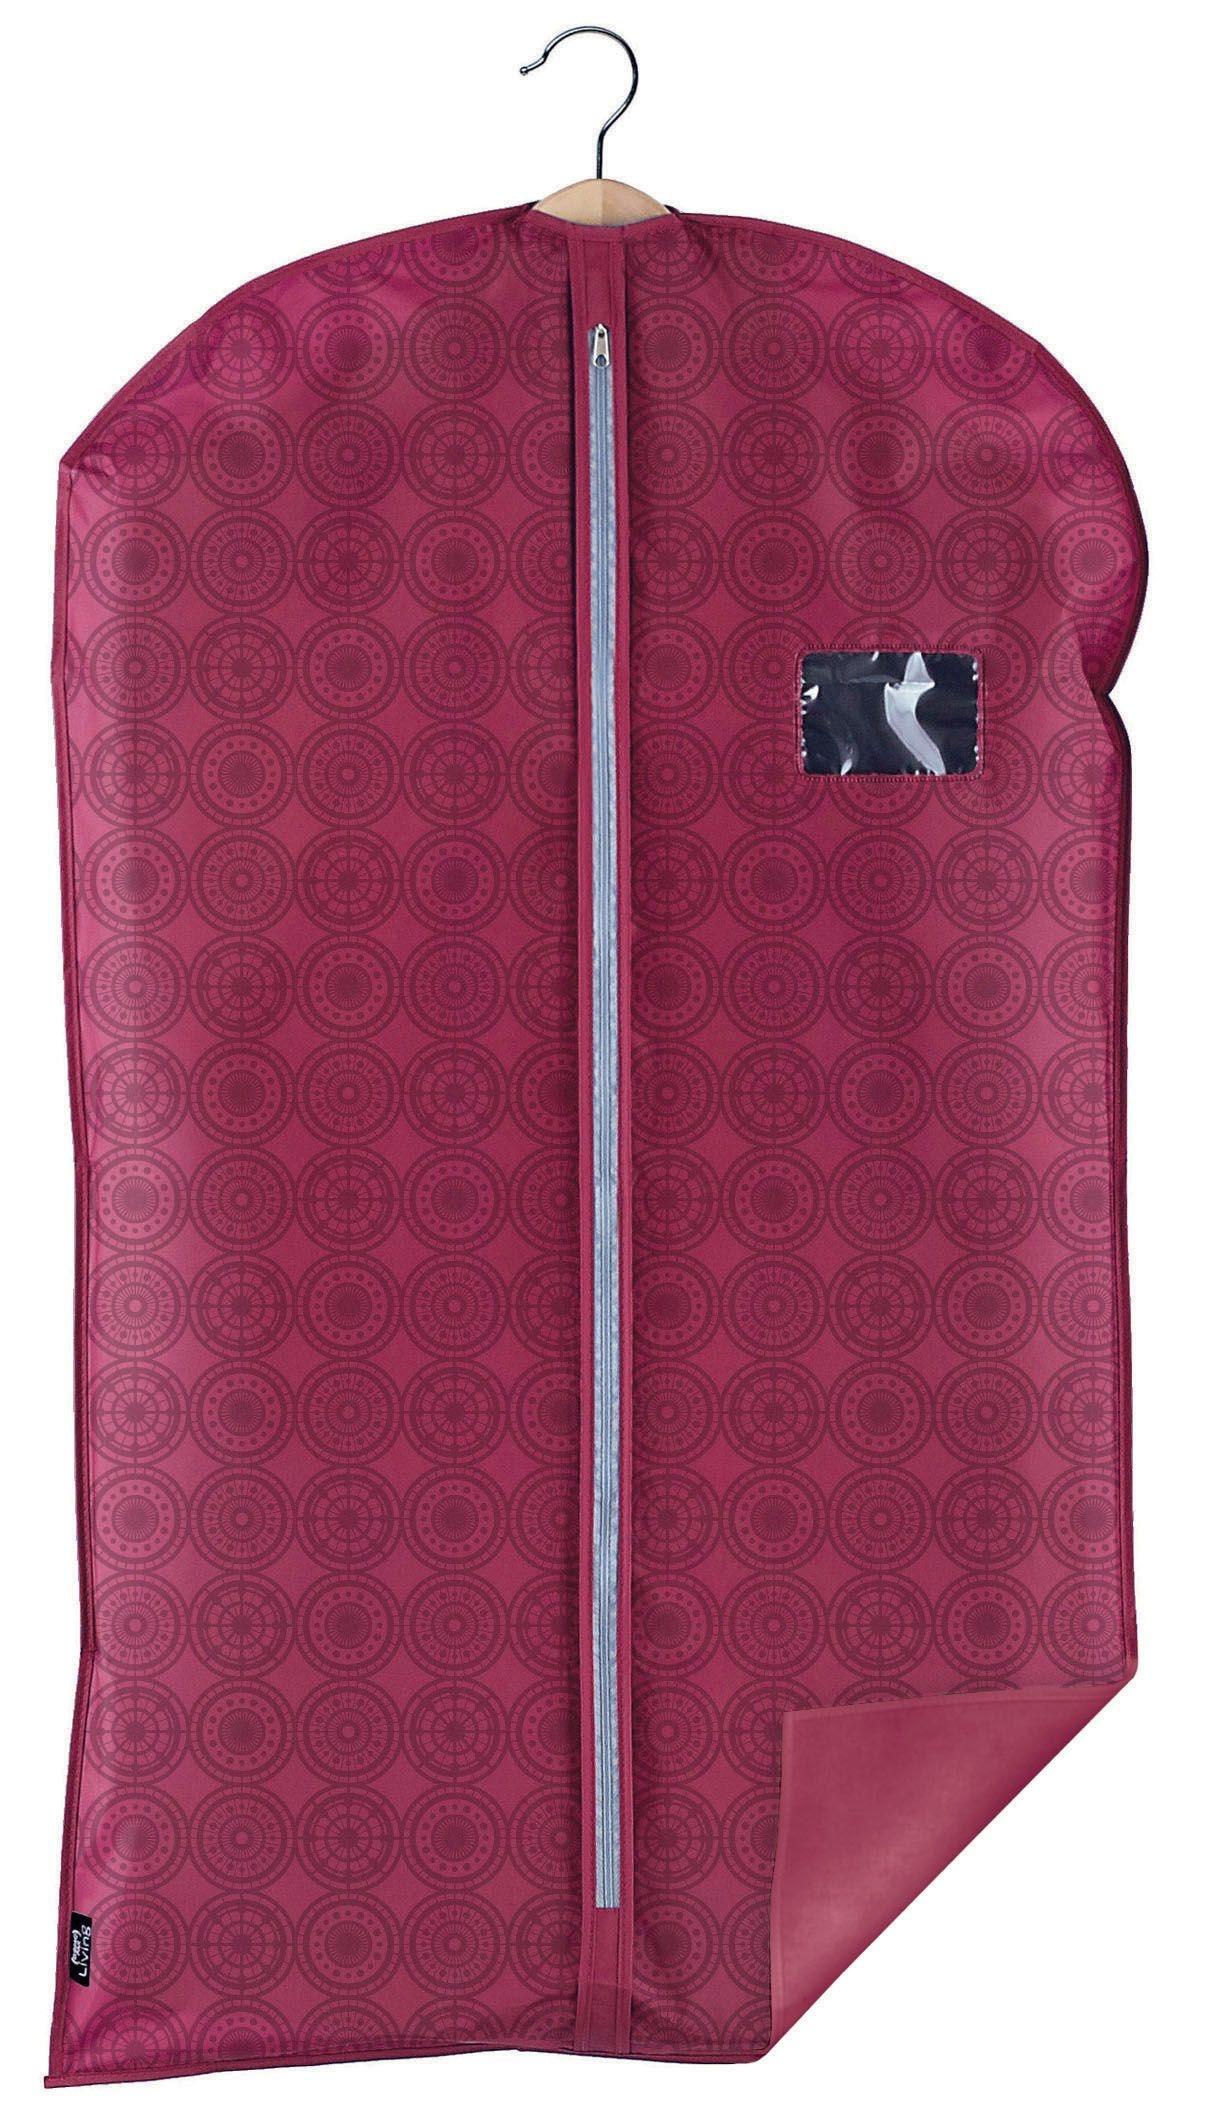 Husa pentru haine cu fermoar, Ella Bordeaux, l60xH100 cm poza